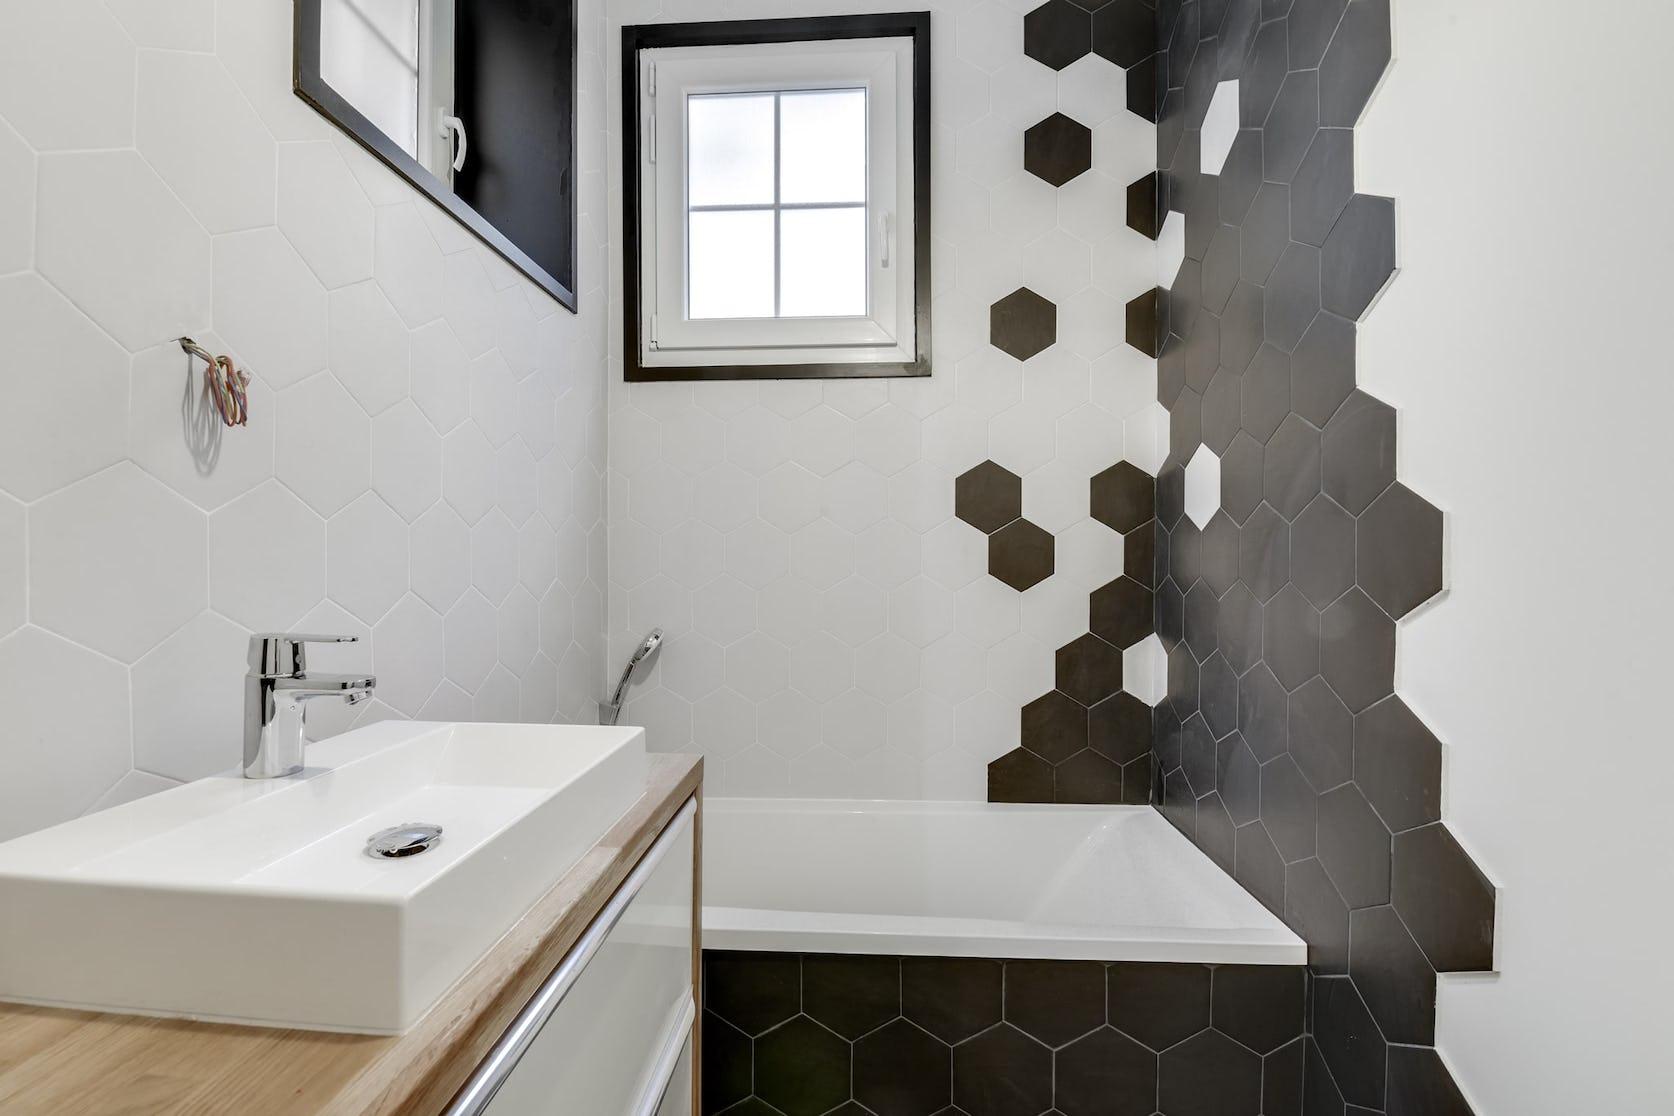 salle de bain carrelage hexagonal bicolore